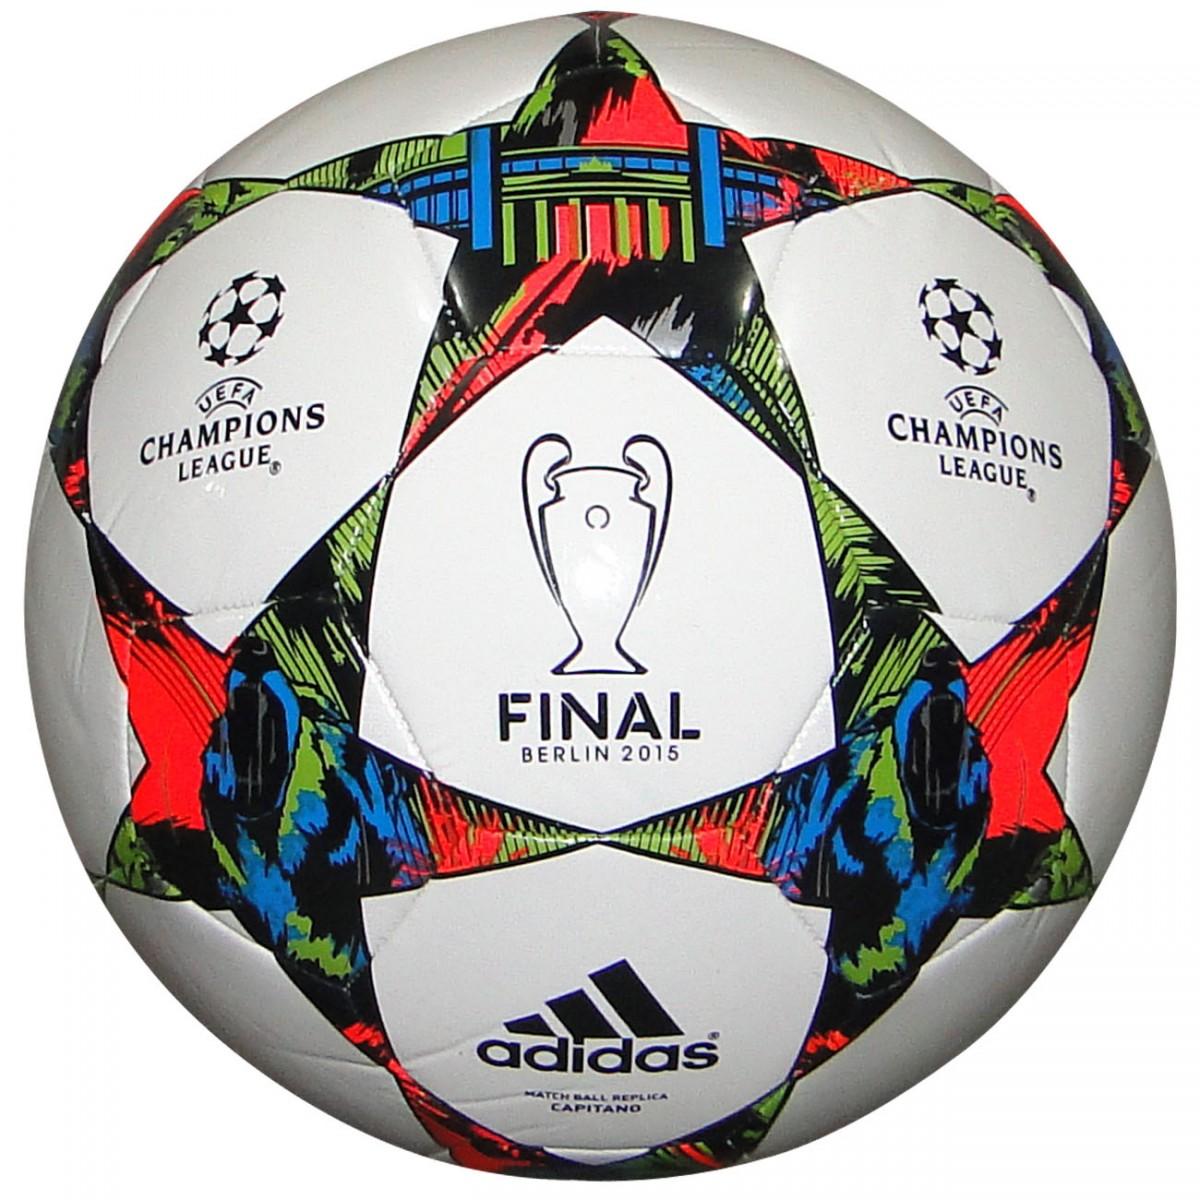 fd16c47888c9c Bola Adidas Finale Berlin 2015 M36921 - Branco Multicolor - Chuteira Nike